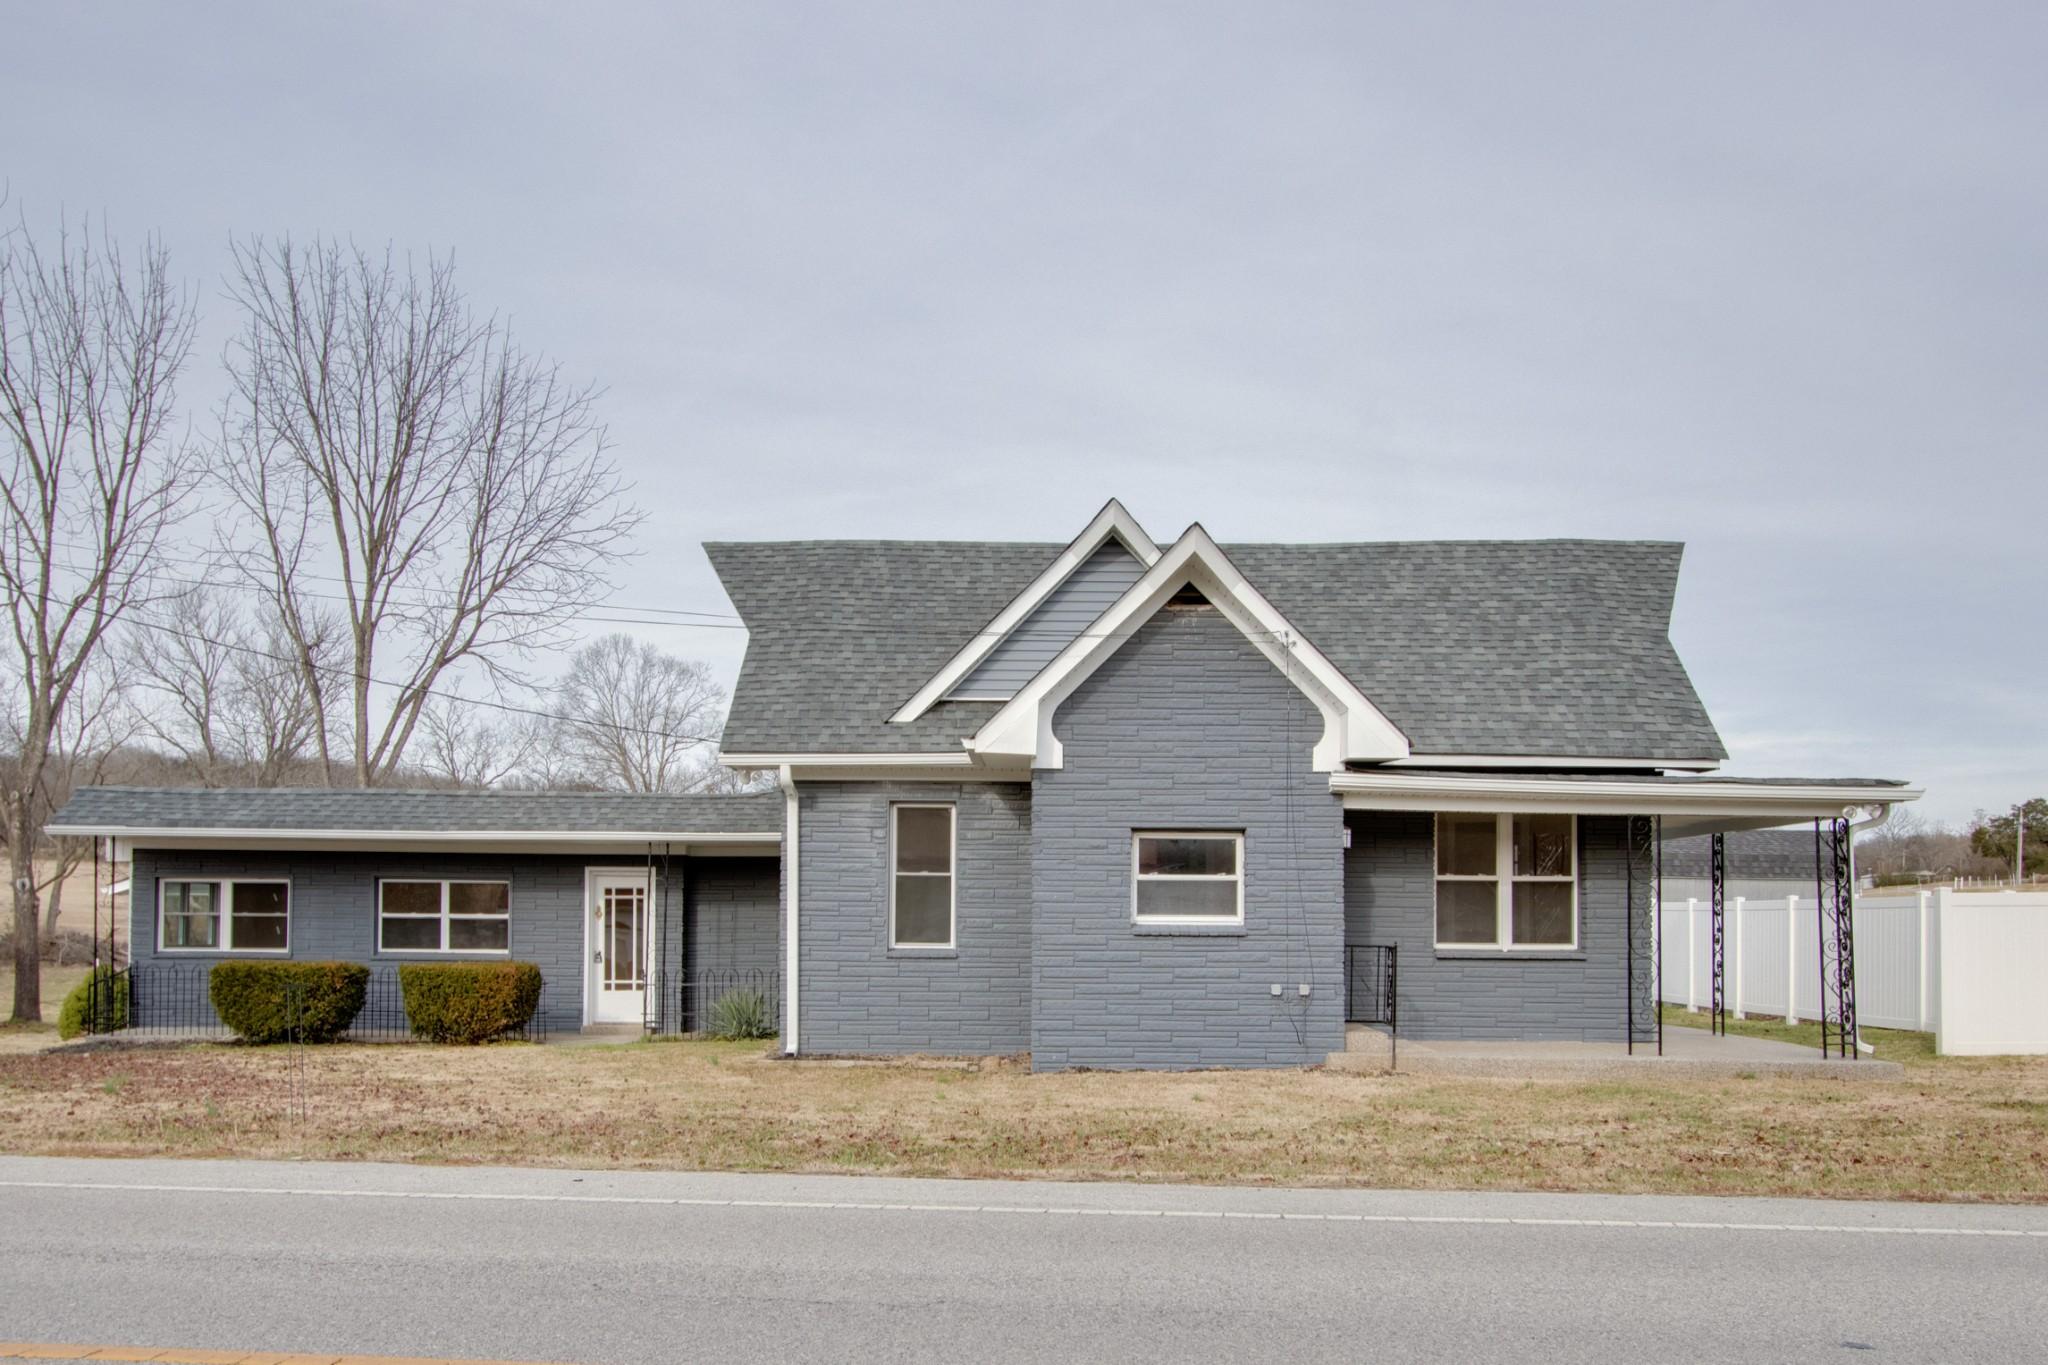 165 Kempville Hwy, Pleasant Shade, TN 37145 - Pleasant Shade, TN real estate listing